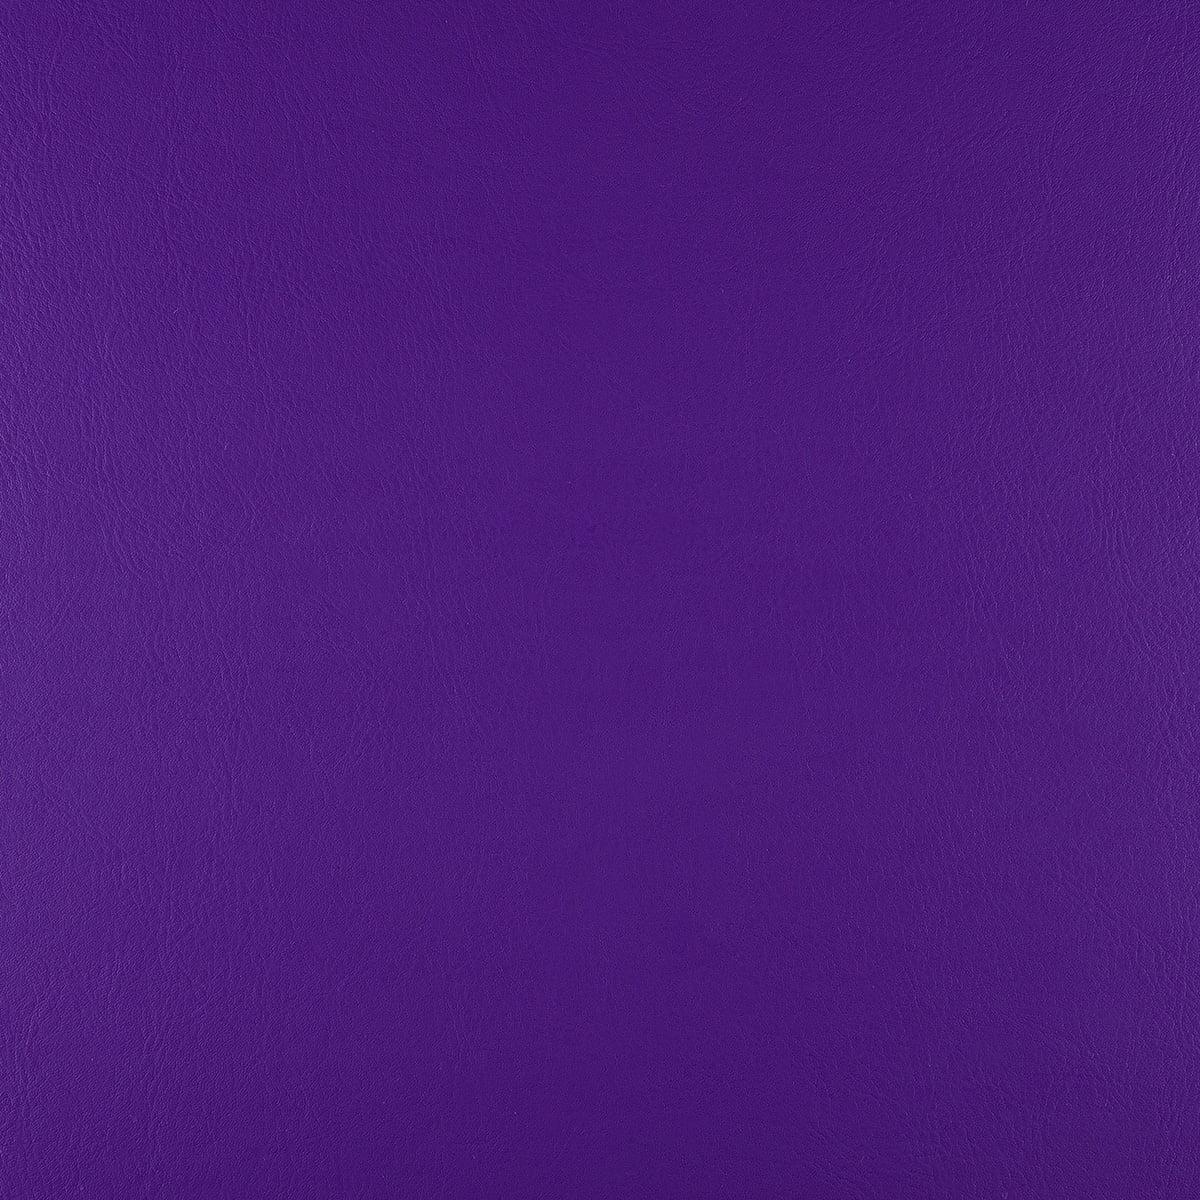 Ultraviolet Purple Chieftain Fabrics